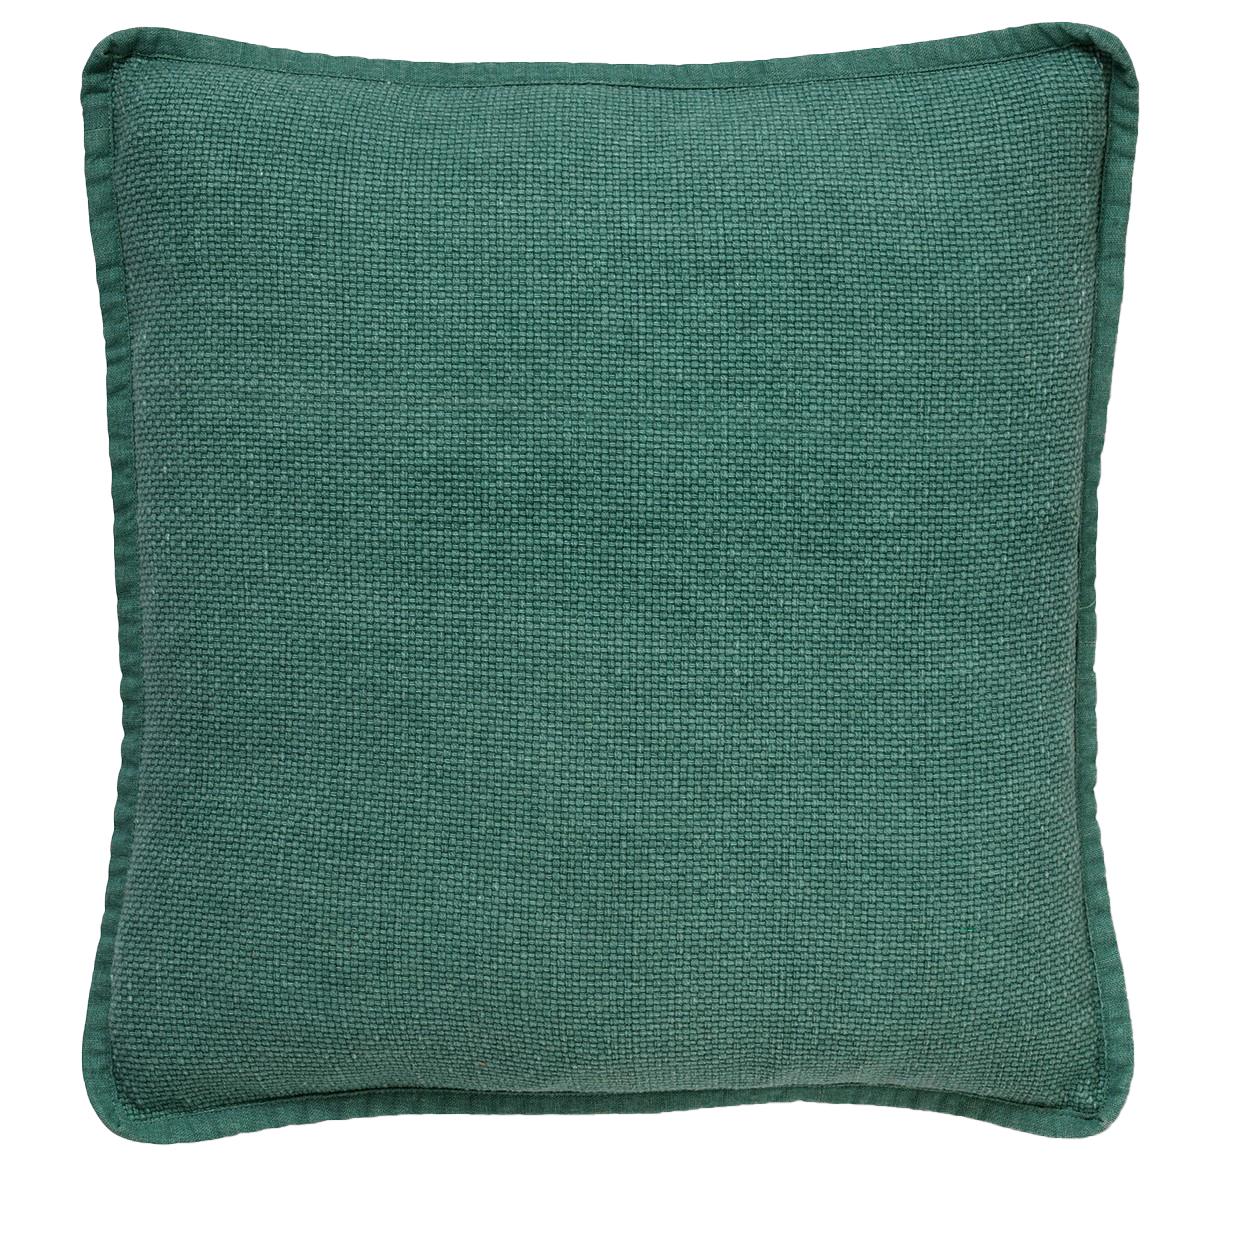 BOWIE - Sierkussen van katoen 45x45 cm Sagebrush Green